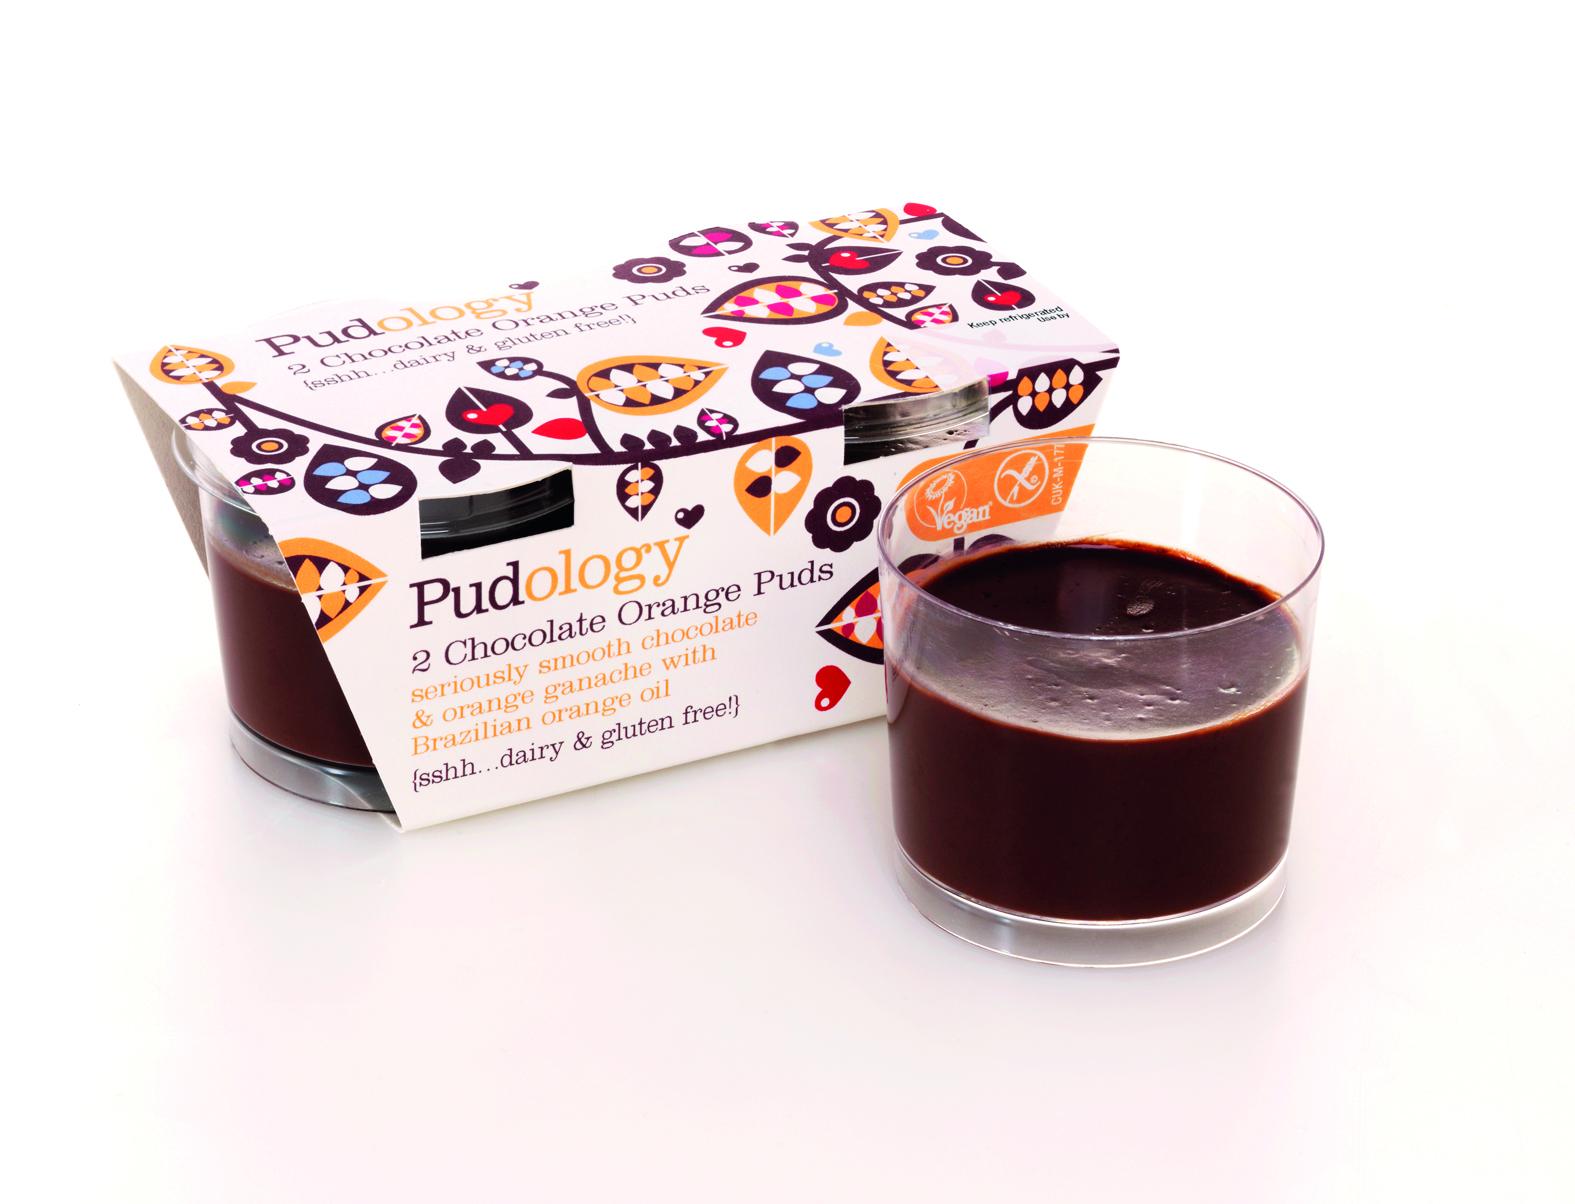 https://i1.wp.com/fatgayvegan.com/wp-content/uploads/2013/10/chocolate-and-orange-pud-pack.jpg?fit=1575%2C1204